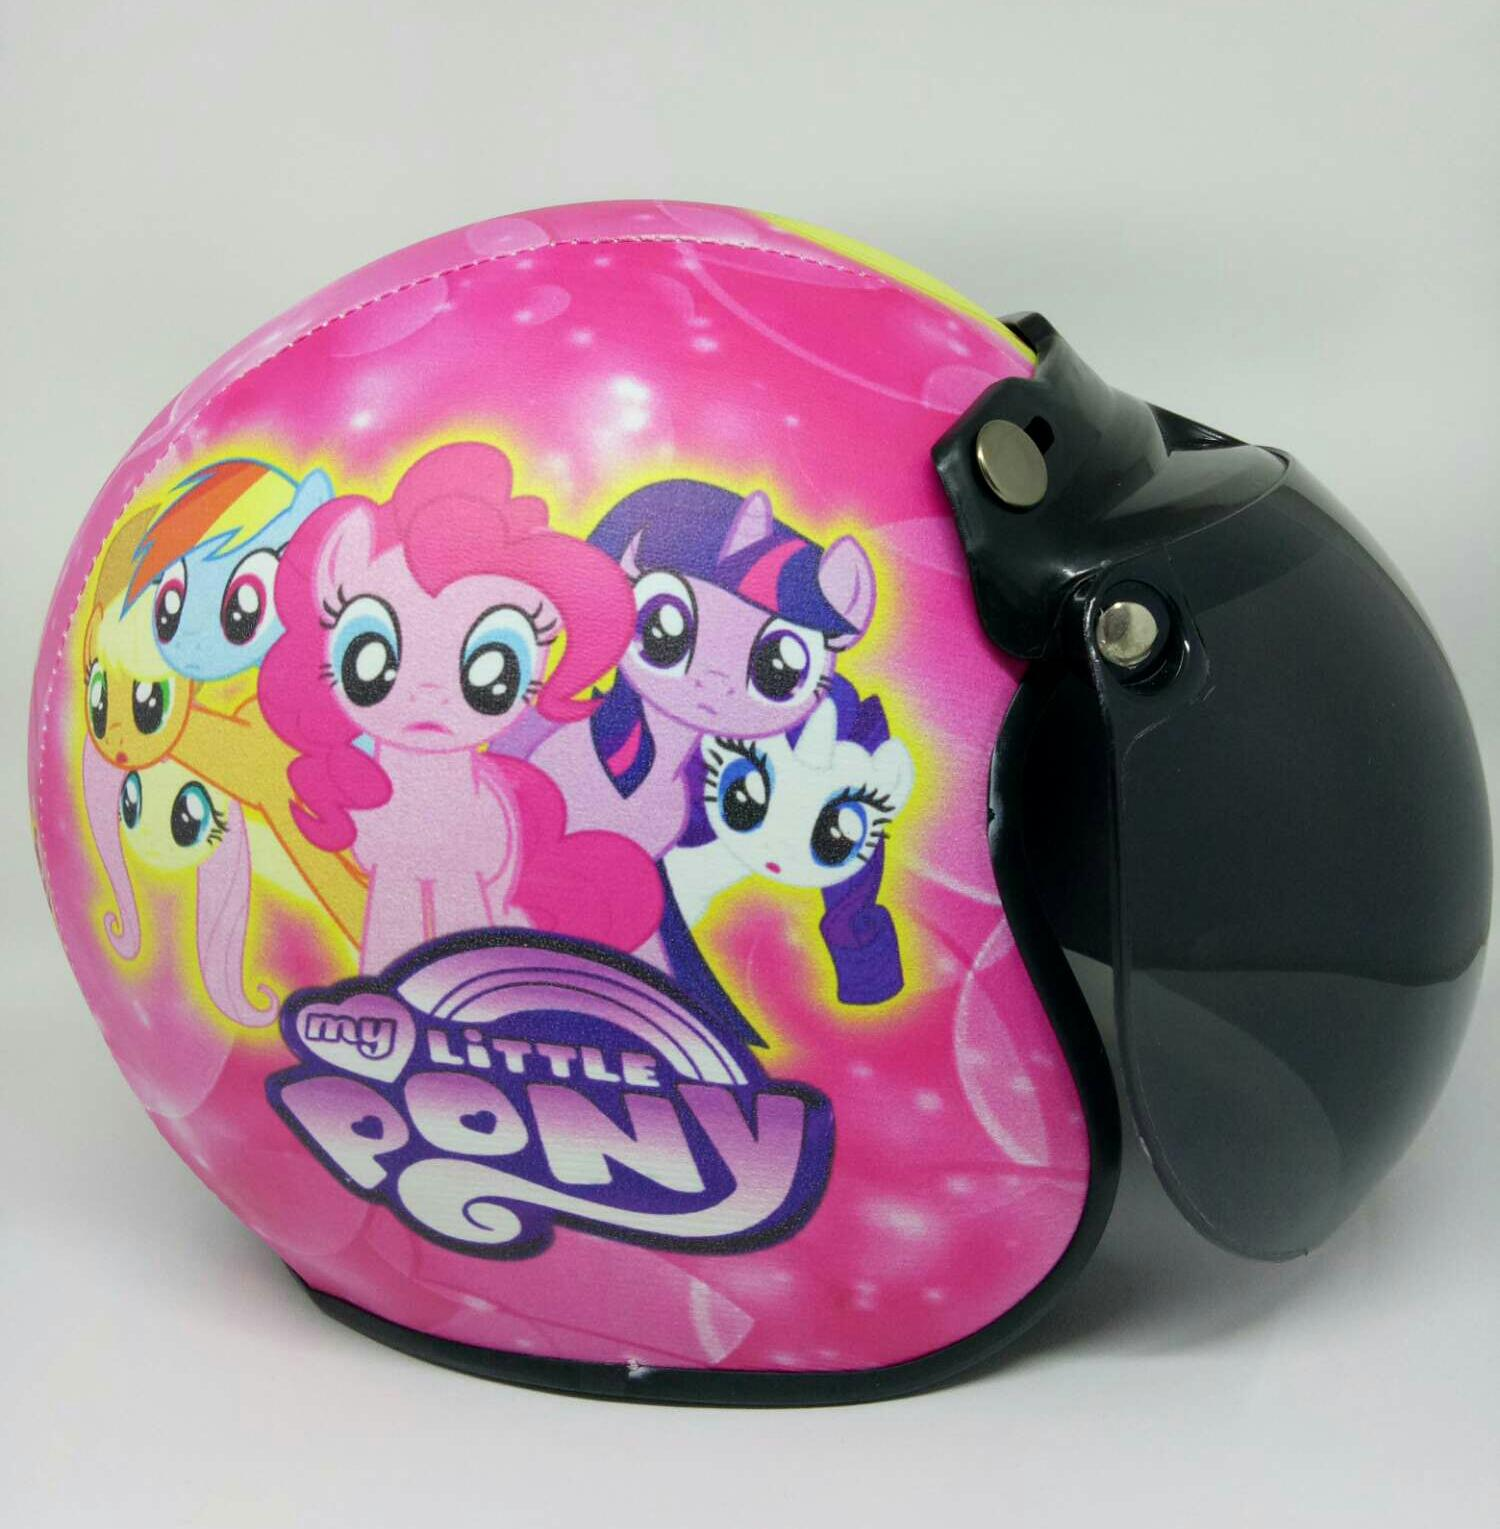 Helm Bogo Anak 2-10 tahun Motif Littlepony Pink Kaca Anak